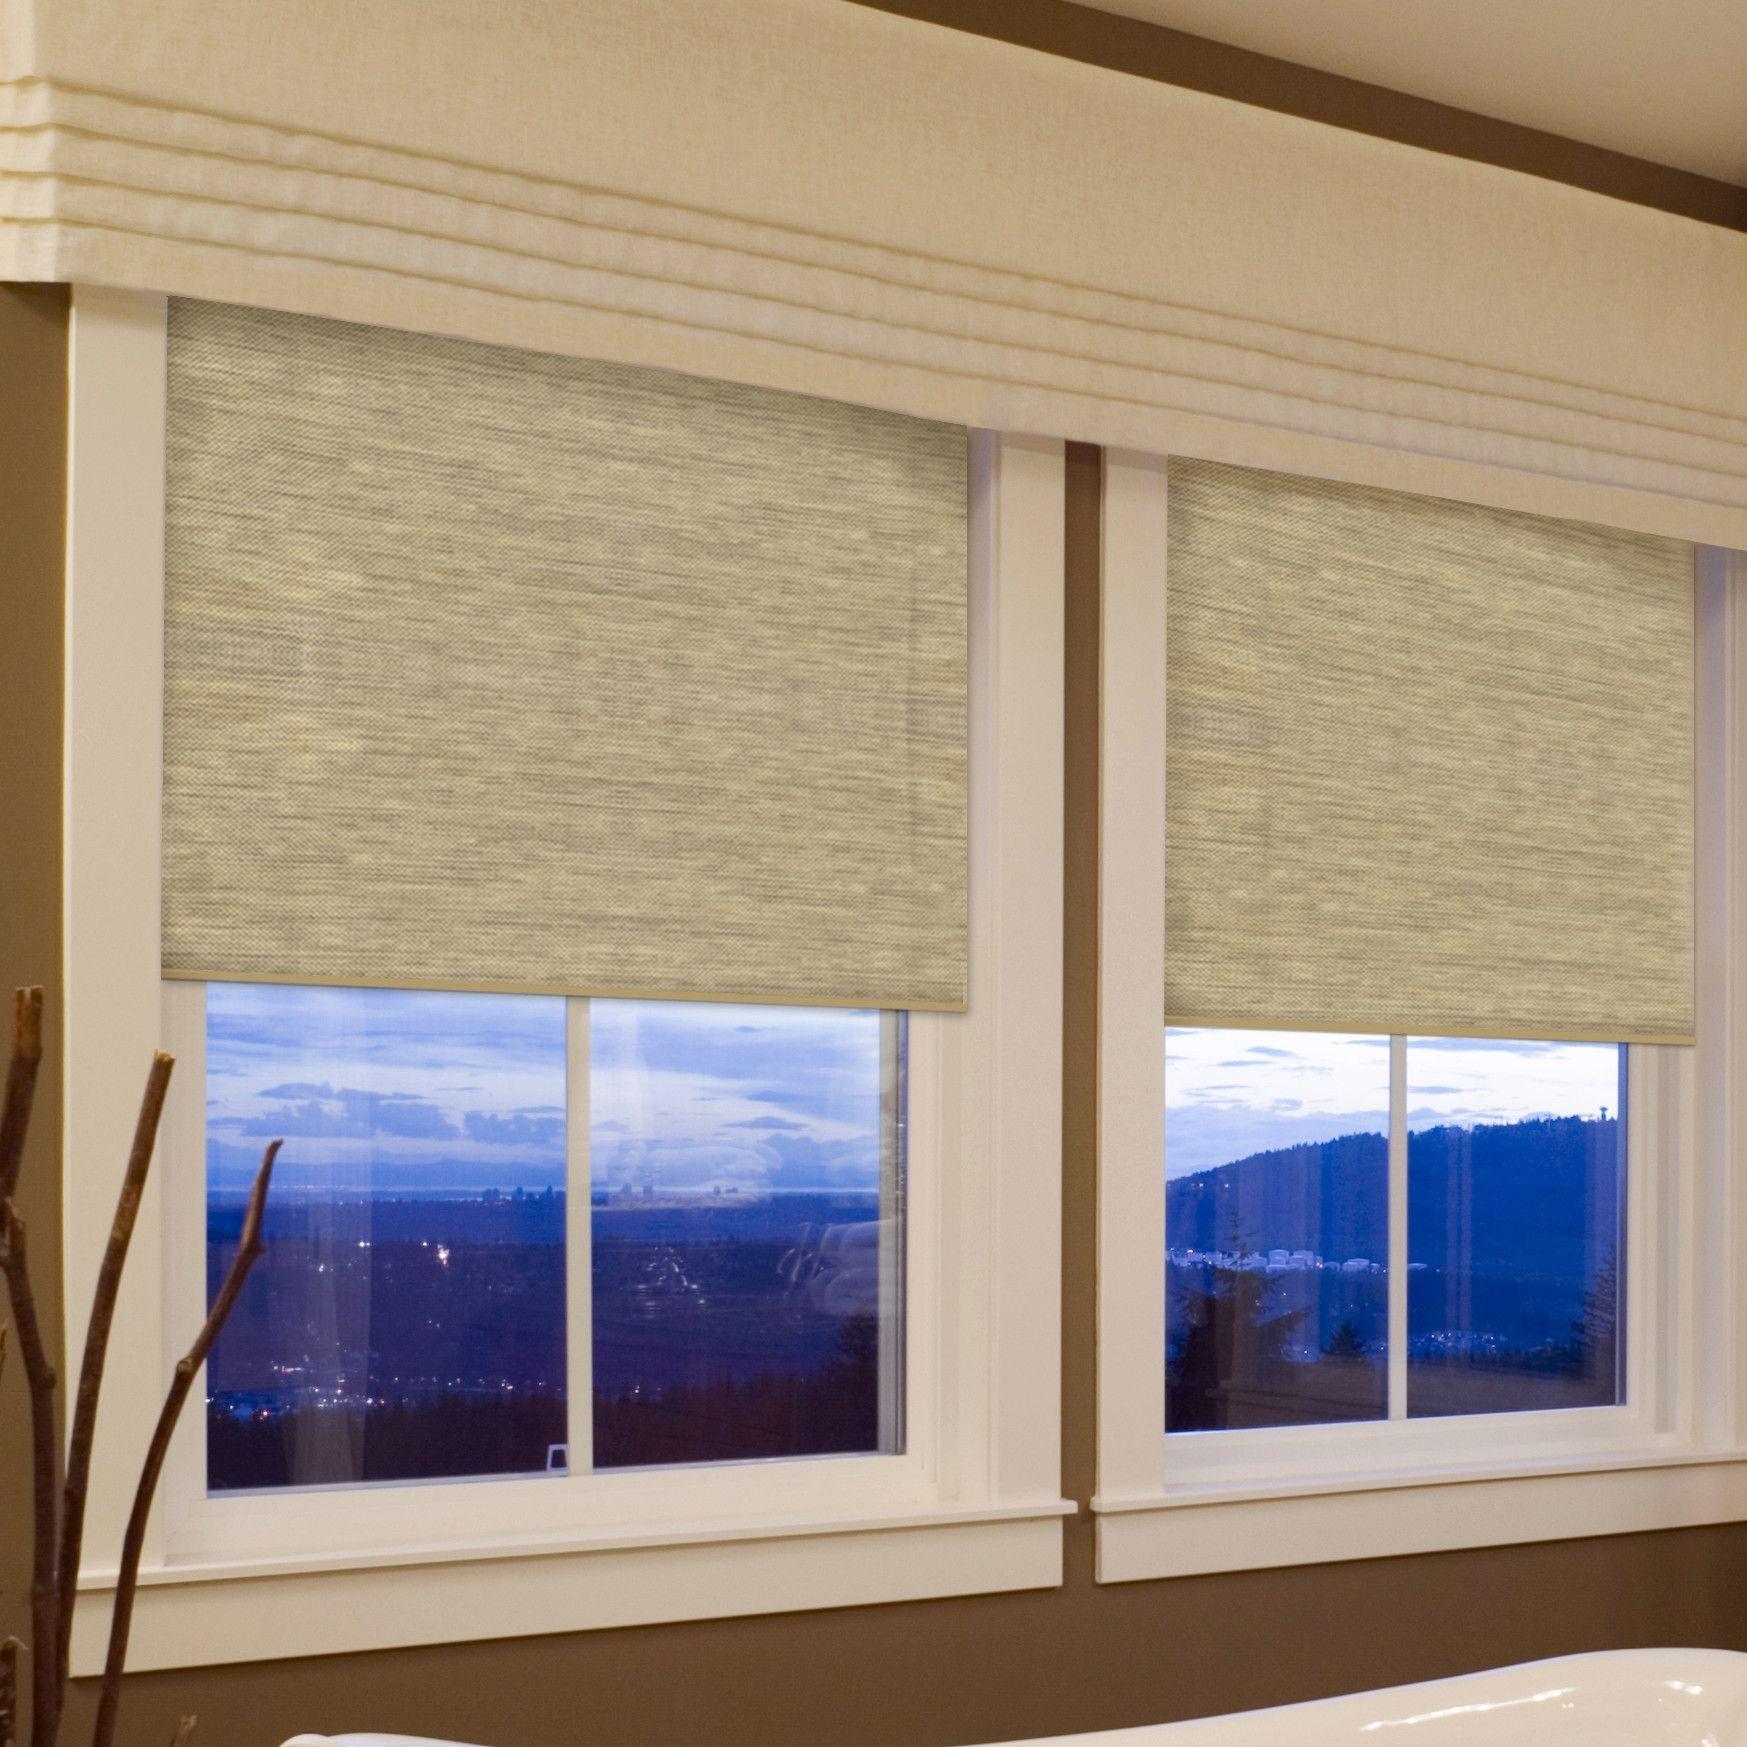 Coolaroo Cordless Roller Shade Cordless Roller Shade Room Darkening Window Shades Window Shades